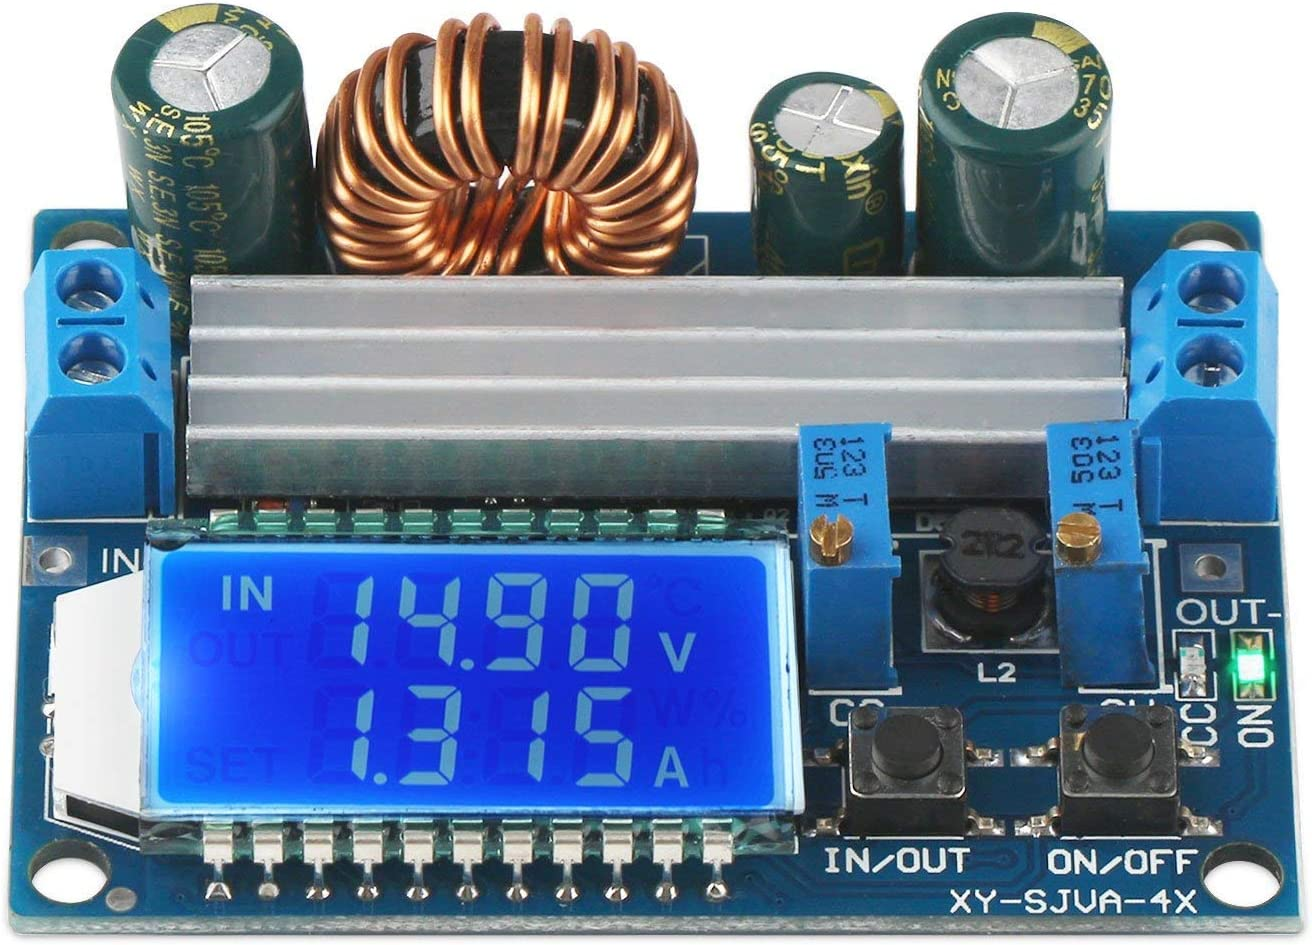 ARCELI Buck Boost Converter Display, DROK Buck-Booster DC 5.5-30V 12v a DC 0.5-30V 5v 24v Voltaje Actual Constante Ajustable Paso Arriba Regulador de Voltaje 3A 35W Módulo de Fuente de alimentación